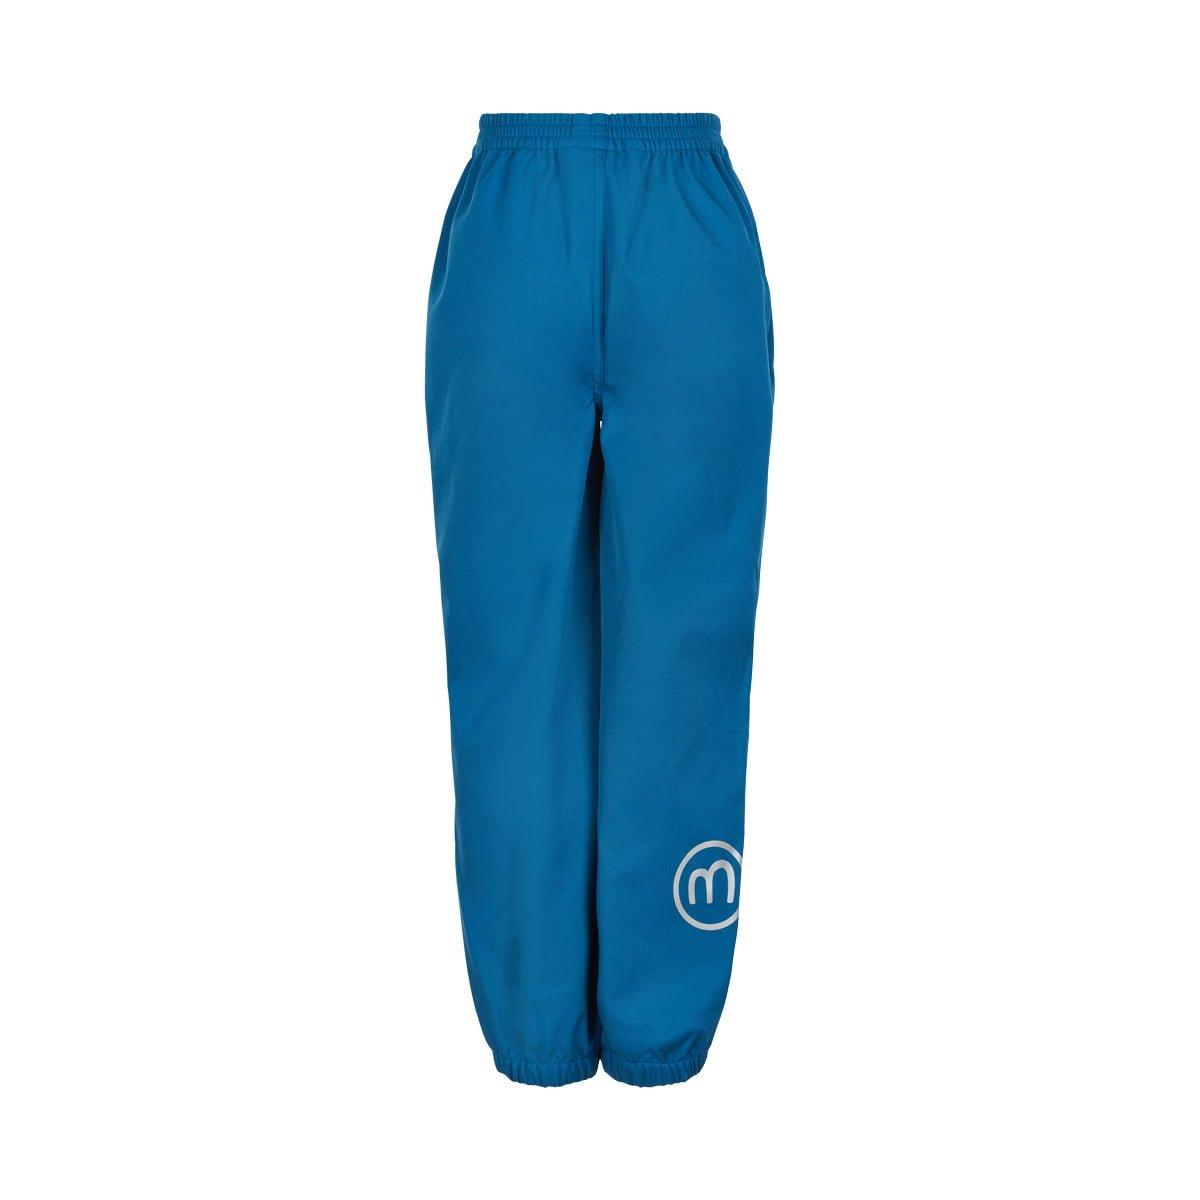 Pantaloni de ploaie și vânt (impermeabili) din softshell Dark Blue Minymo 2